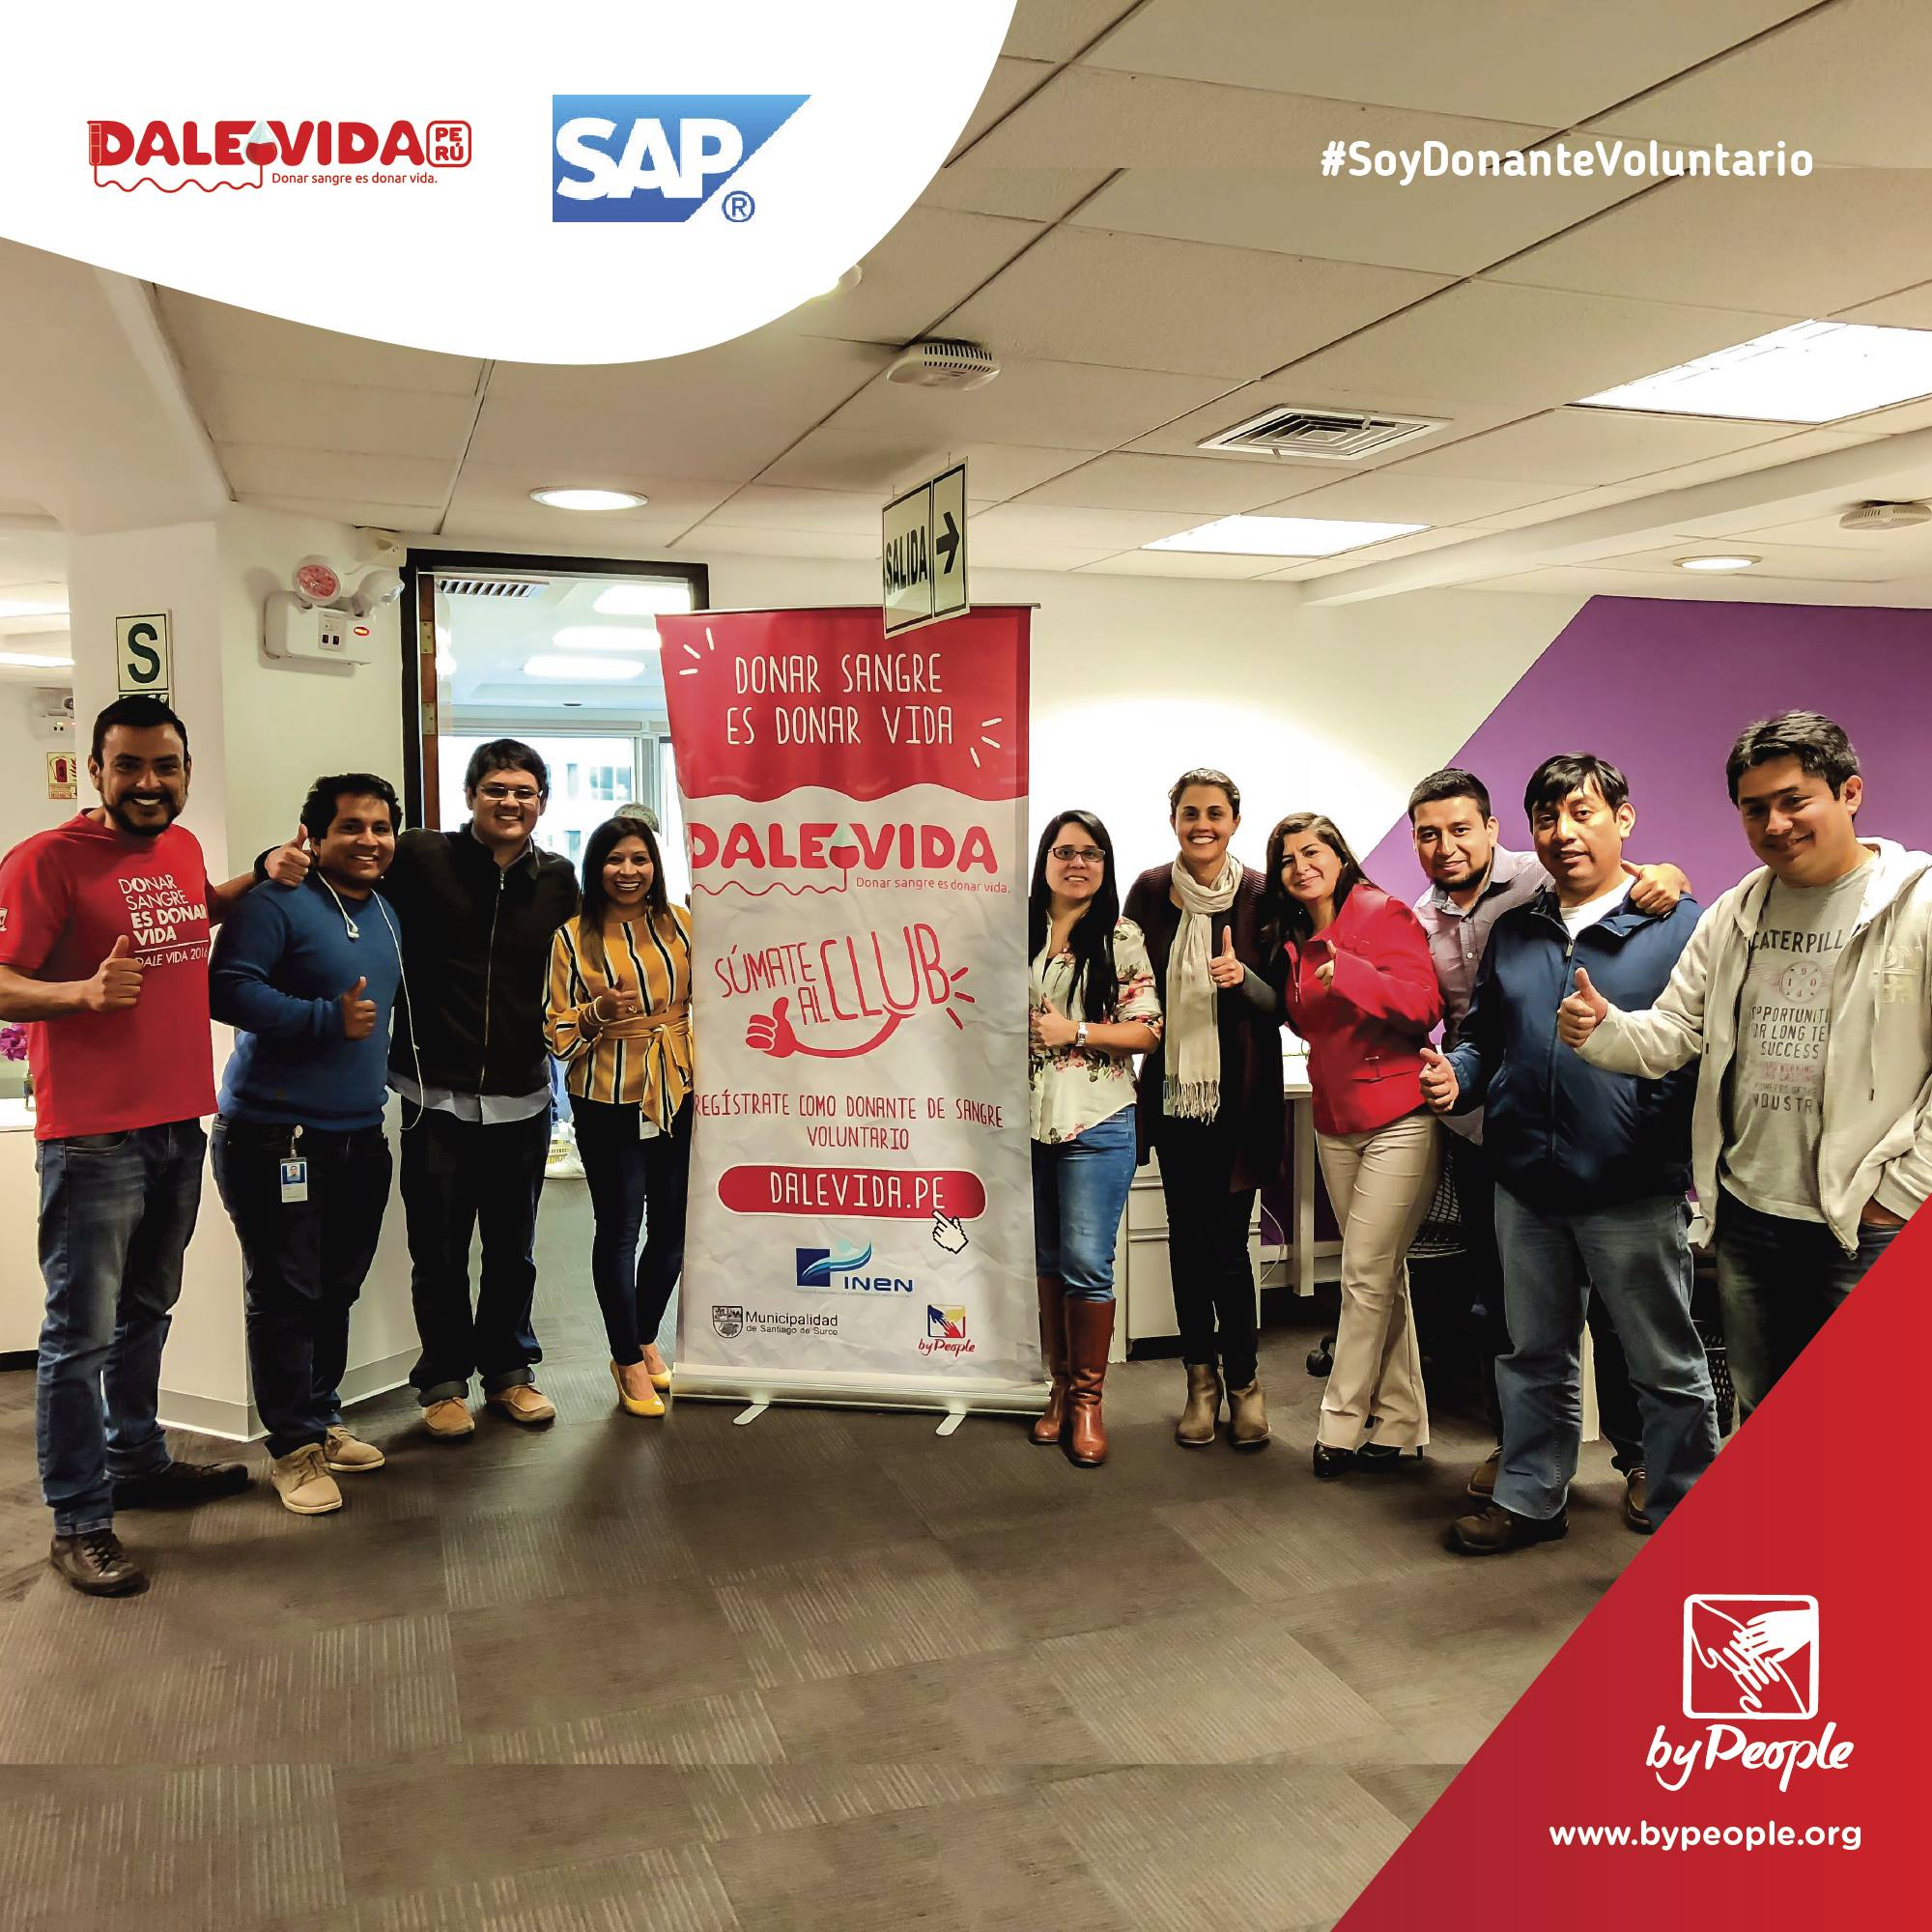 (Dia 2) Dale Vida SAP Ariba 2018: 18/10/2018